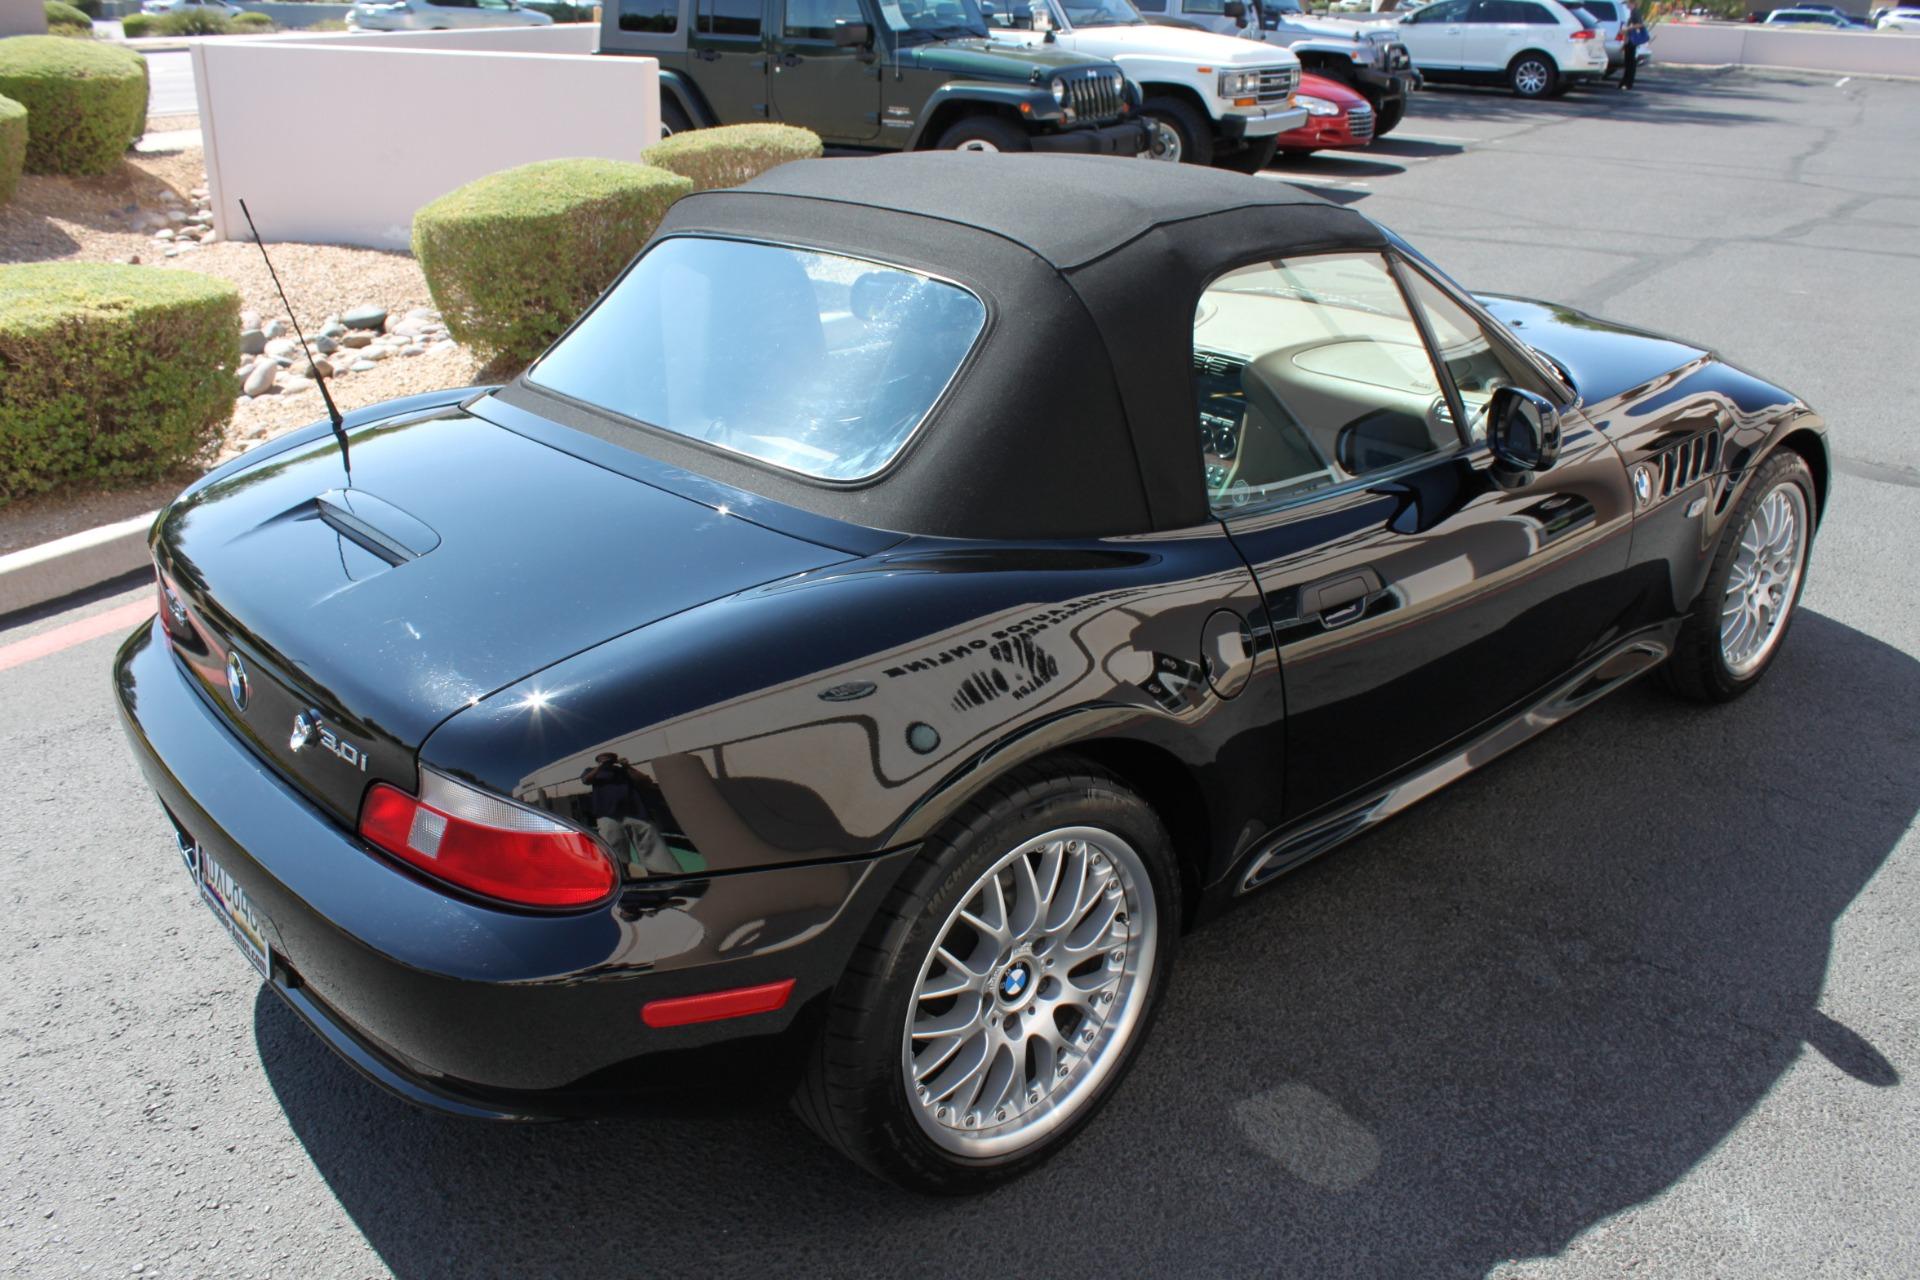 Used-2001-BMW-Z3-Roadster-30i-Used-Mazdas-Gurnee